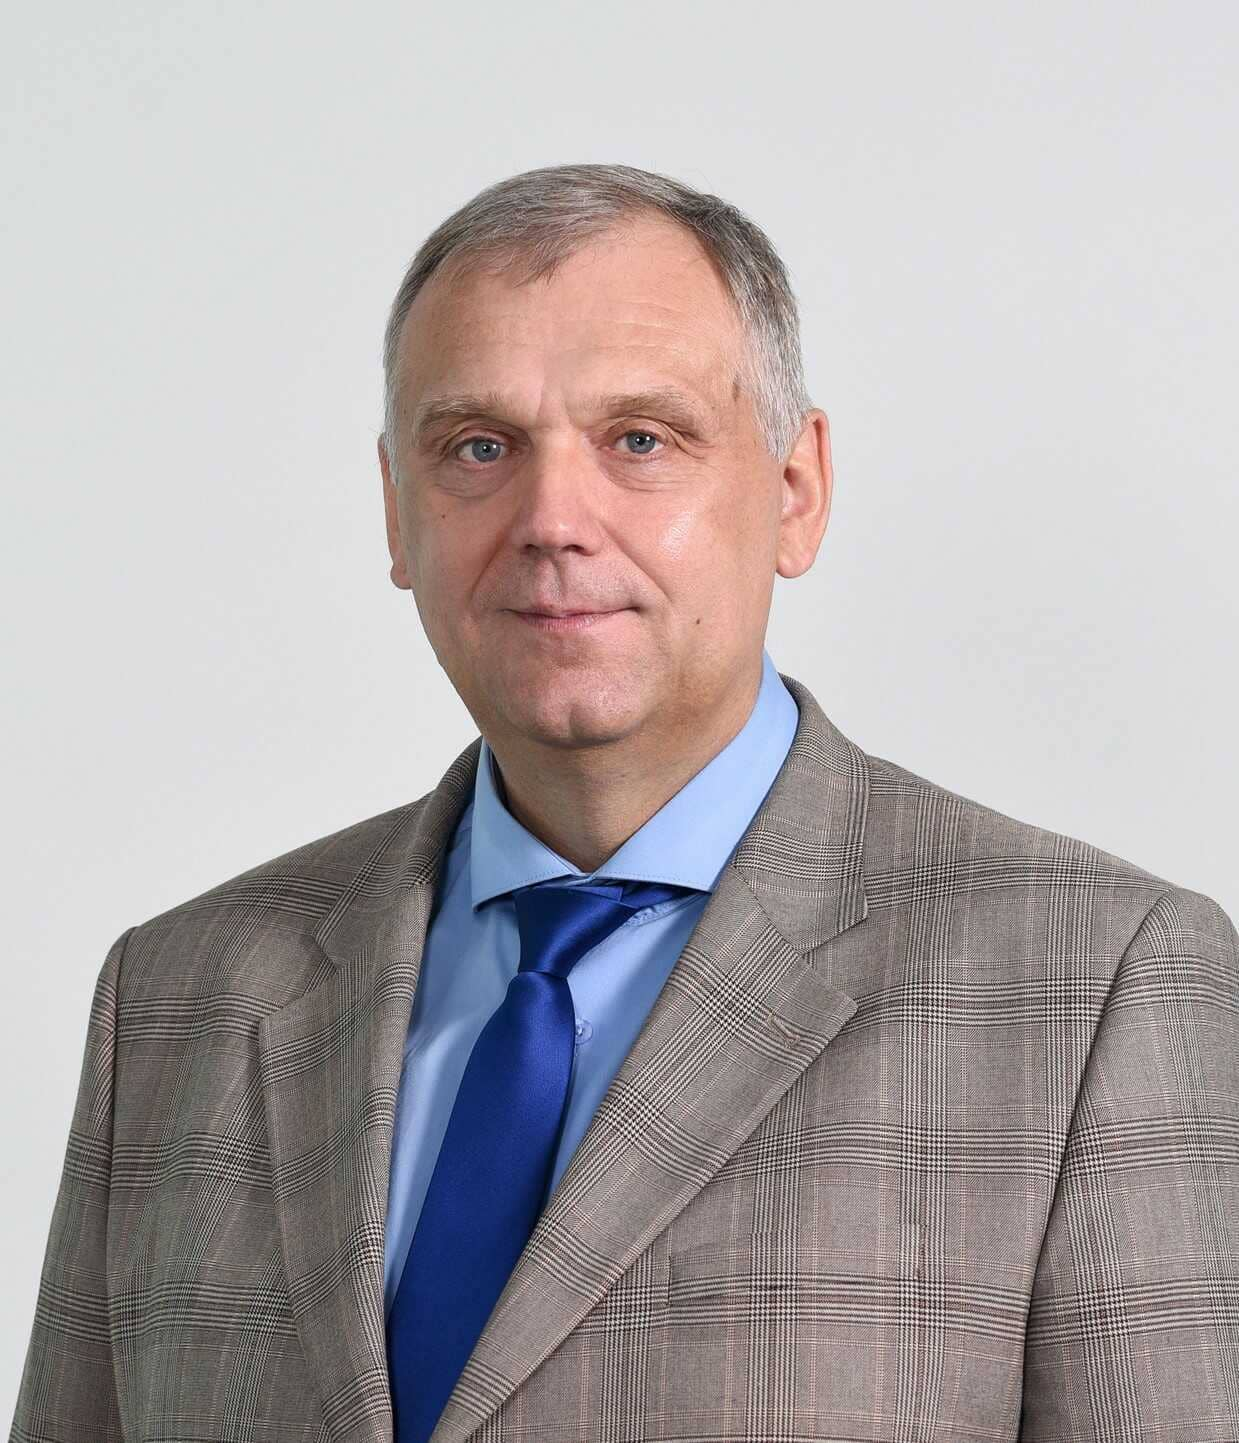 Эксперт в области автоматизации ЖКХ